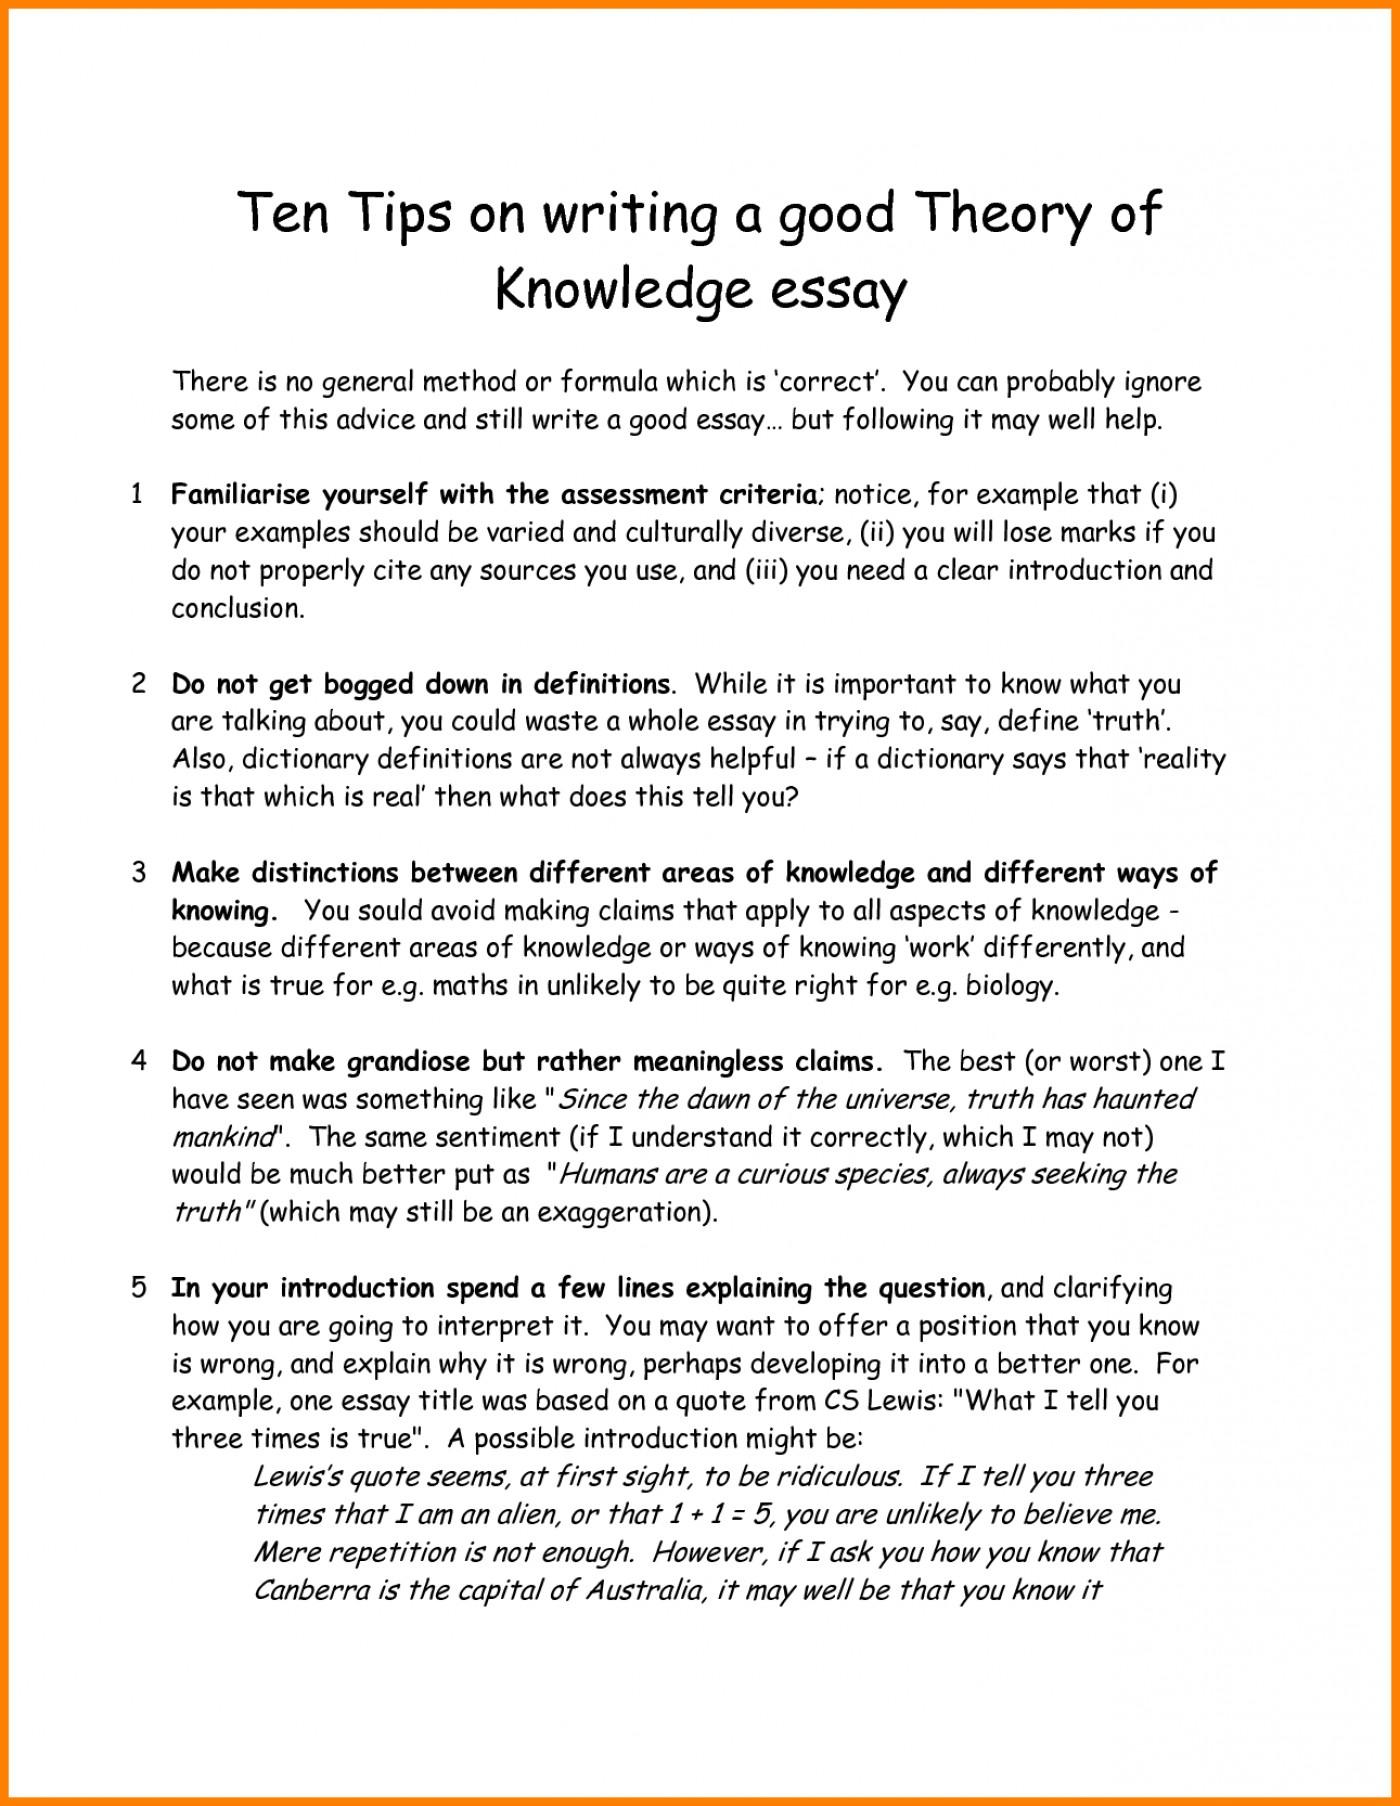 Help with writing a microbiology term paper on impetigo